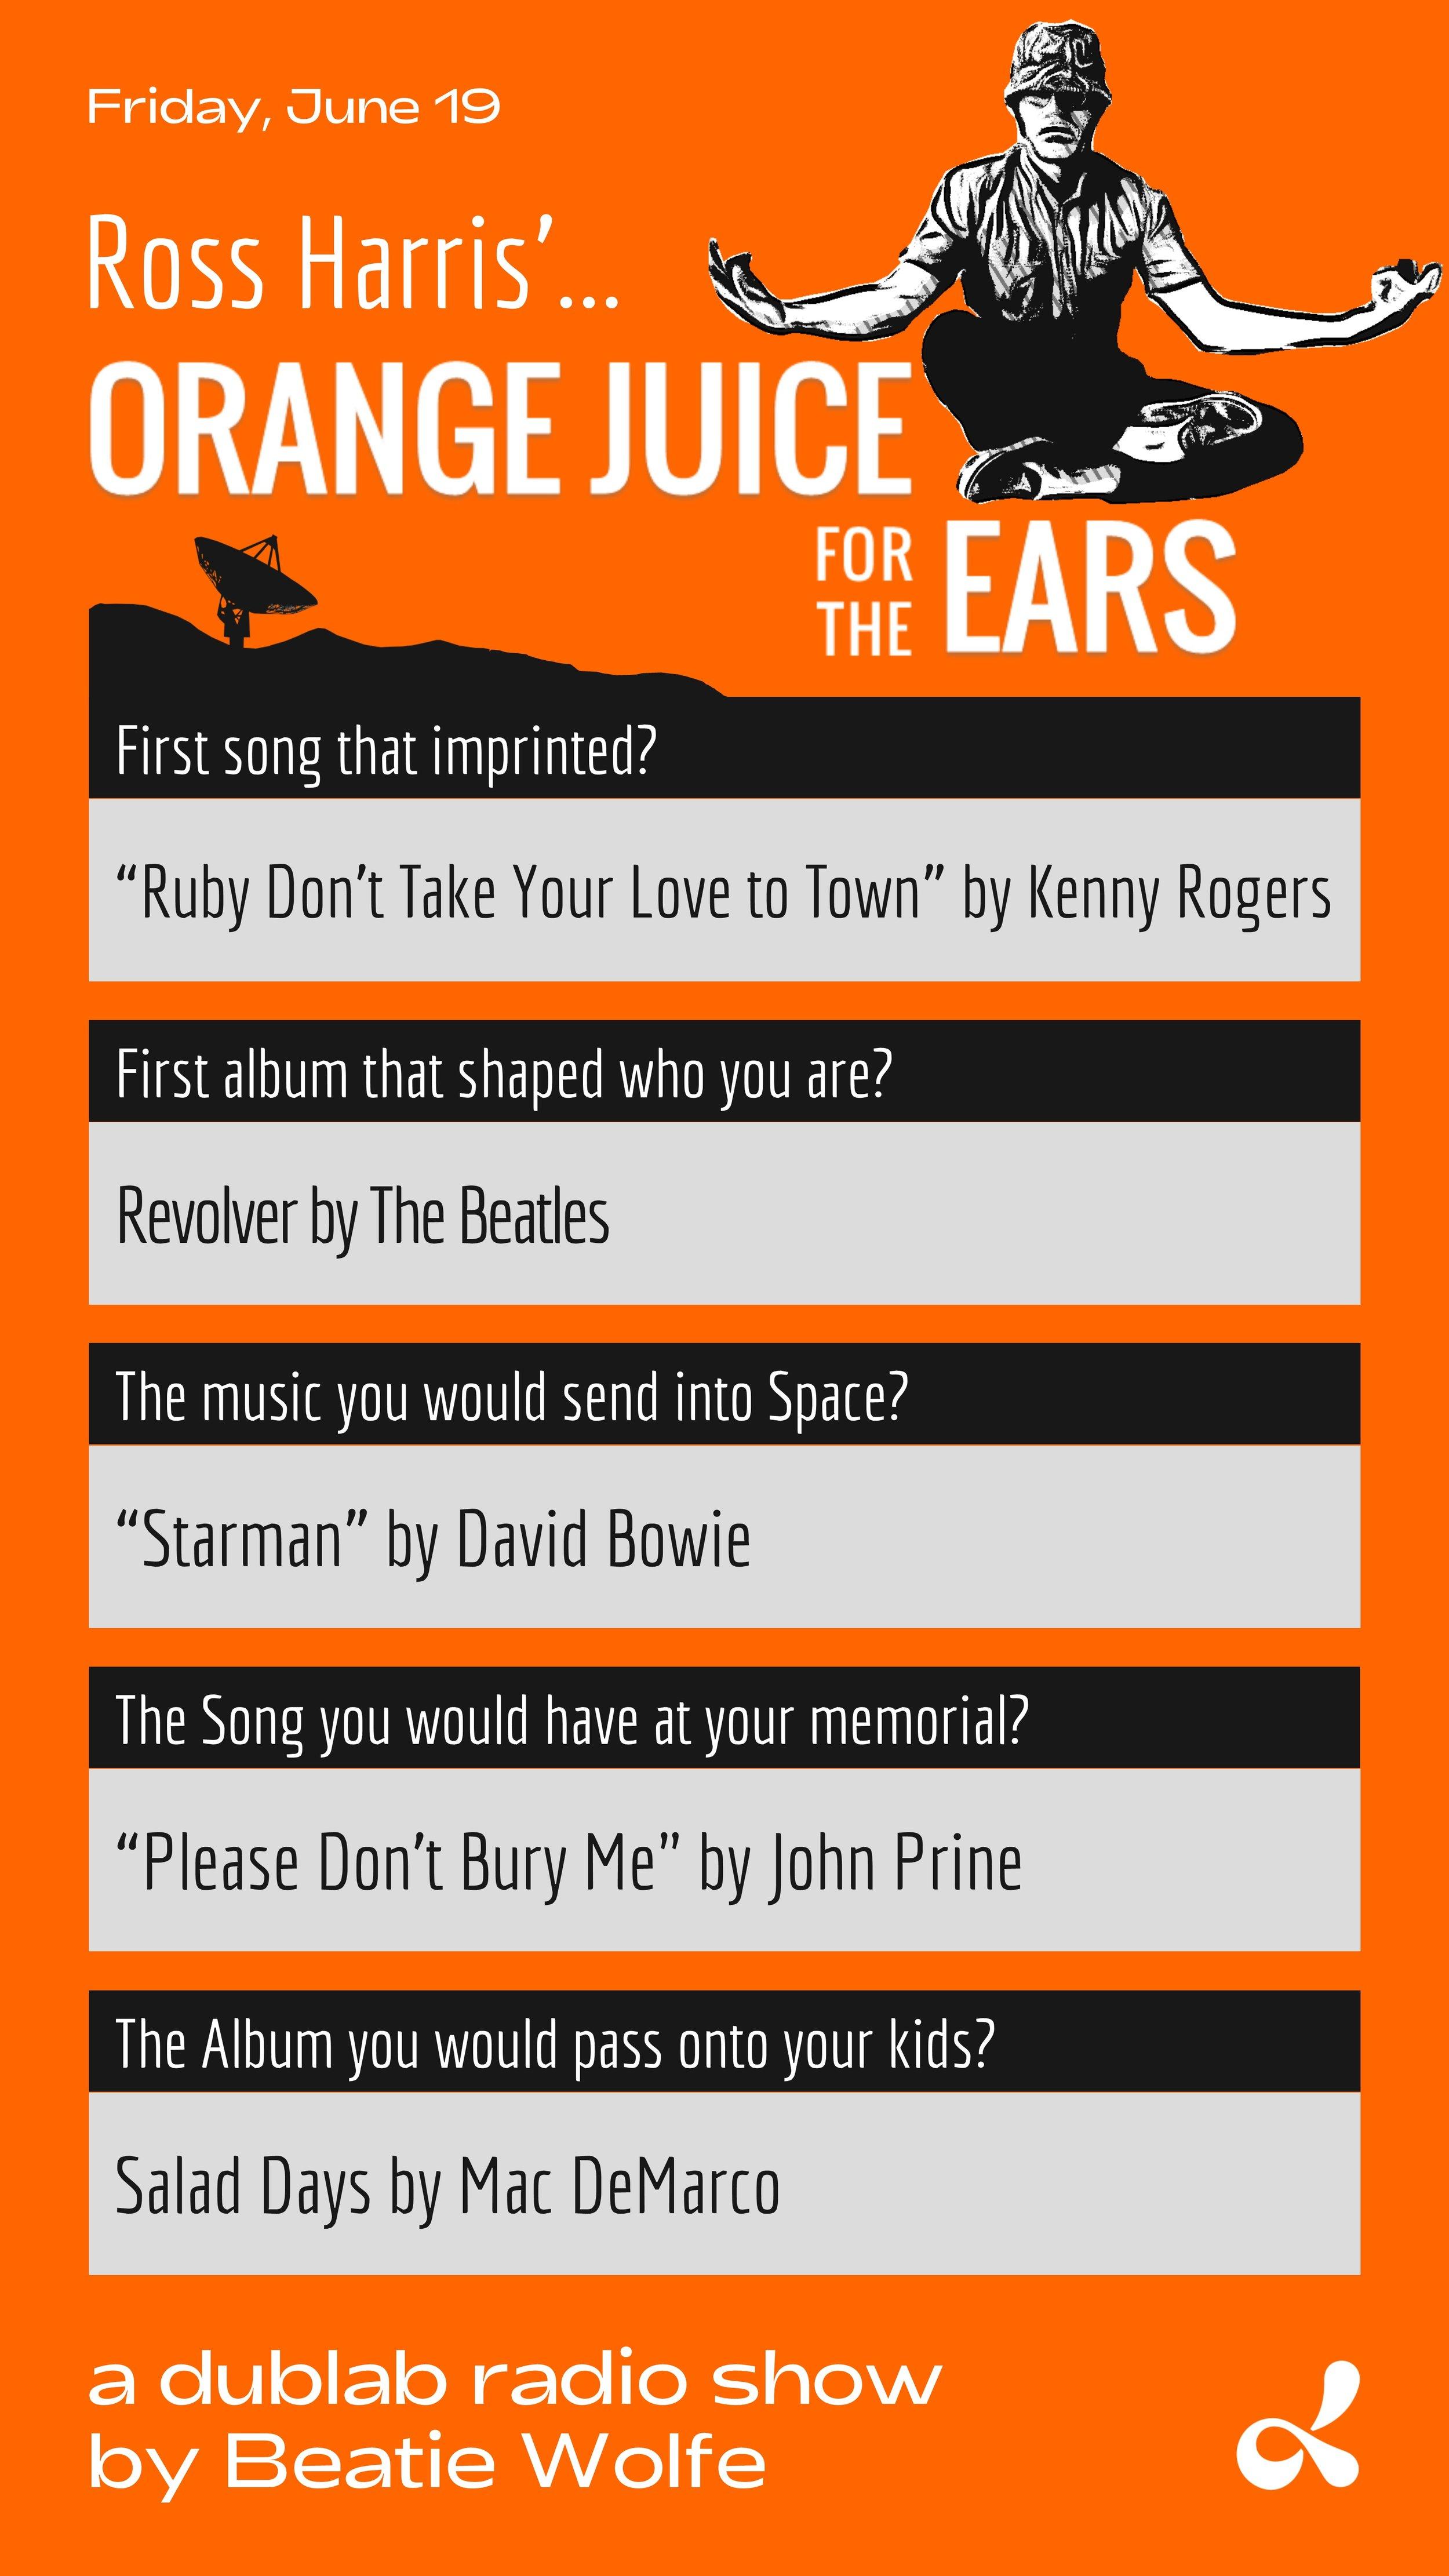 Ear OJ Tracks - Ross Harris - IG Stories.jpg